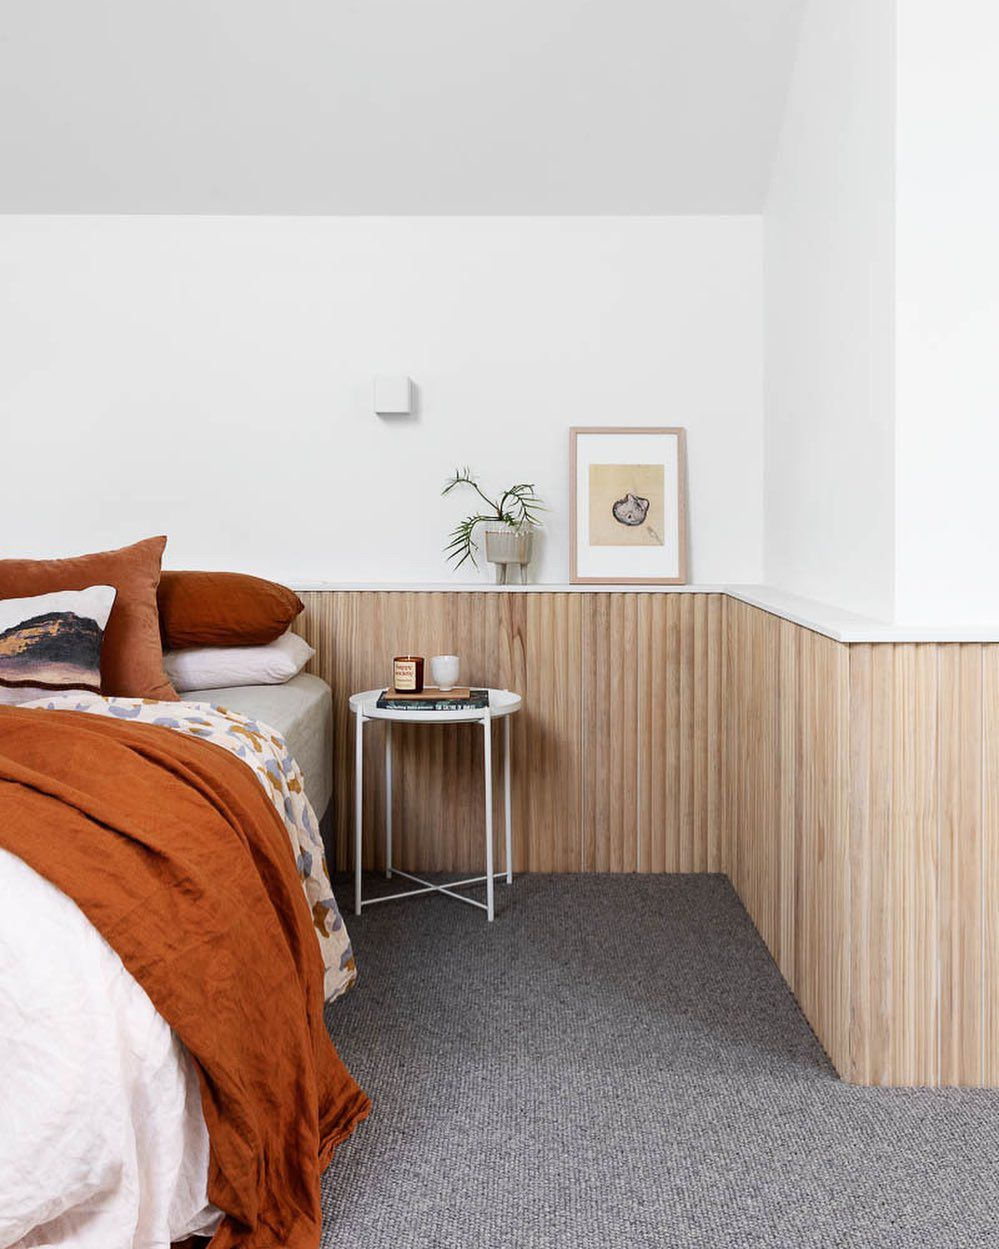 Wainscot wall in bedroom